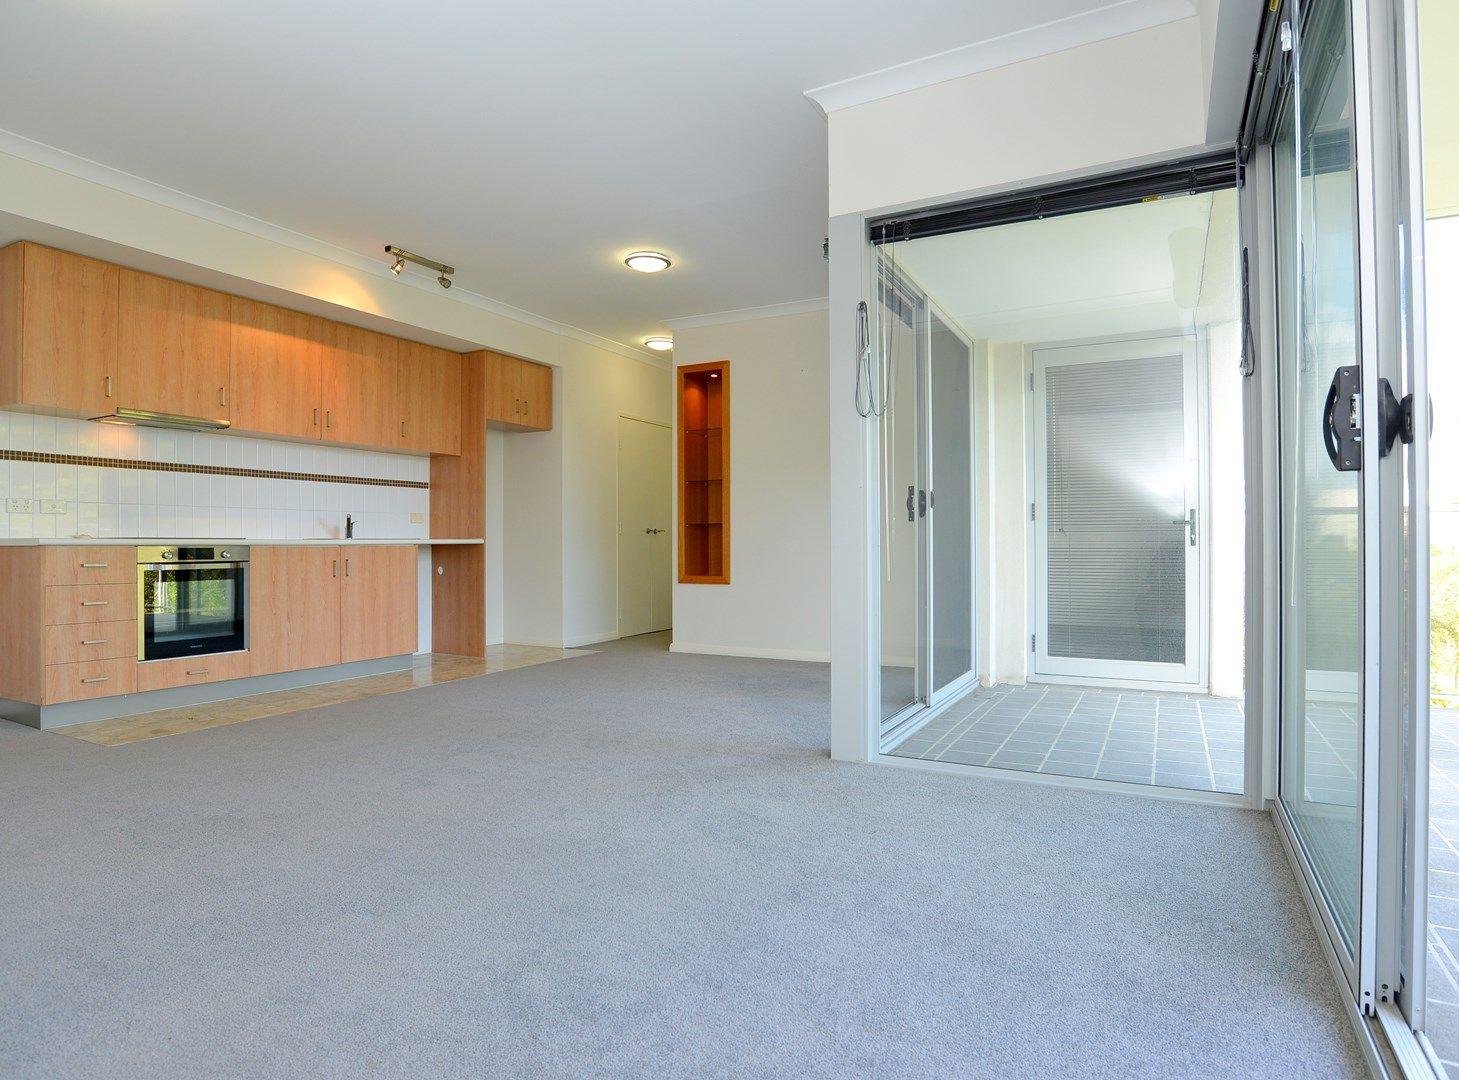 7/1331 Hay Street, West Perth WA 6005, Image 0